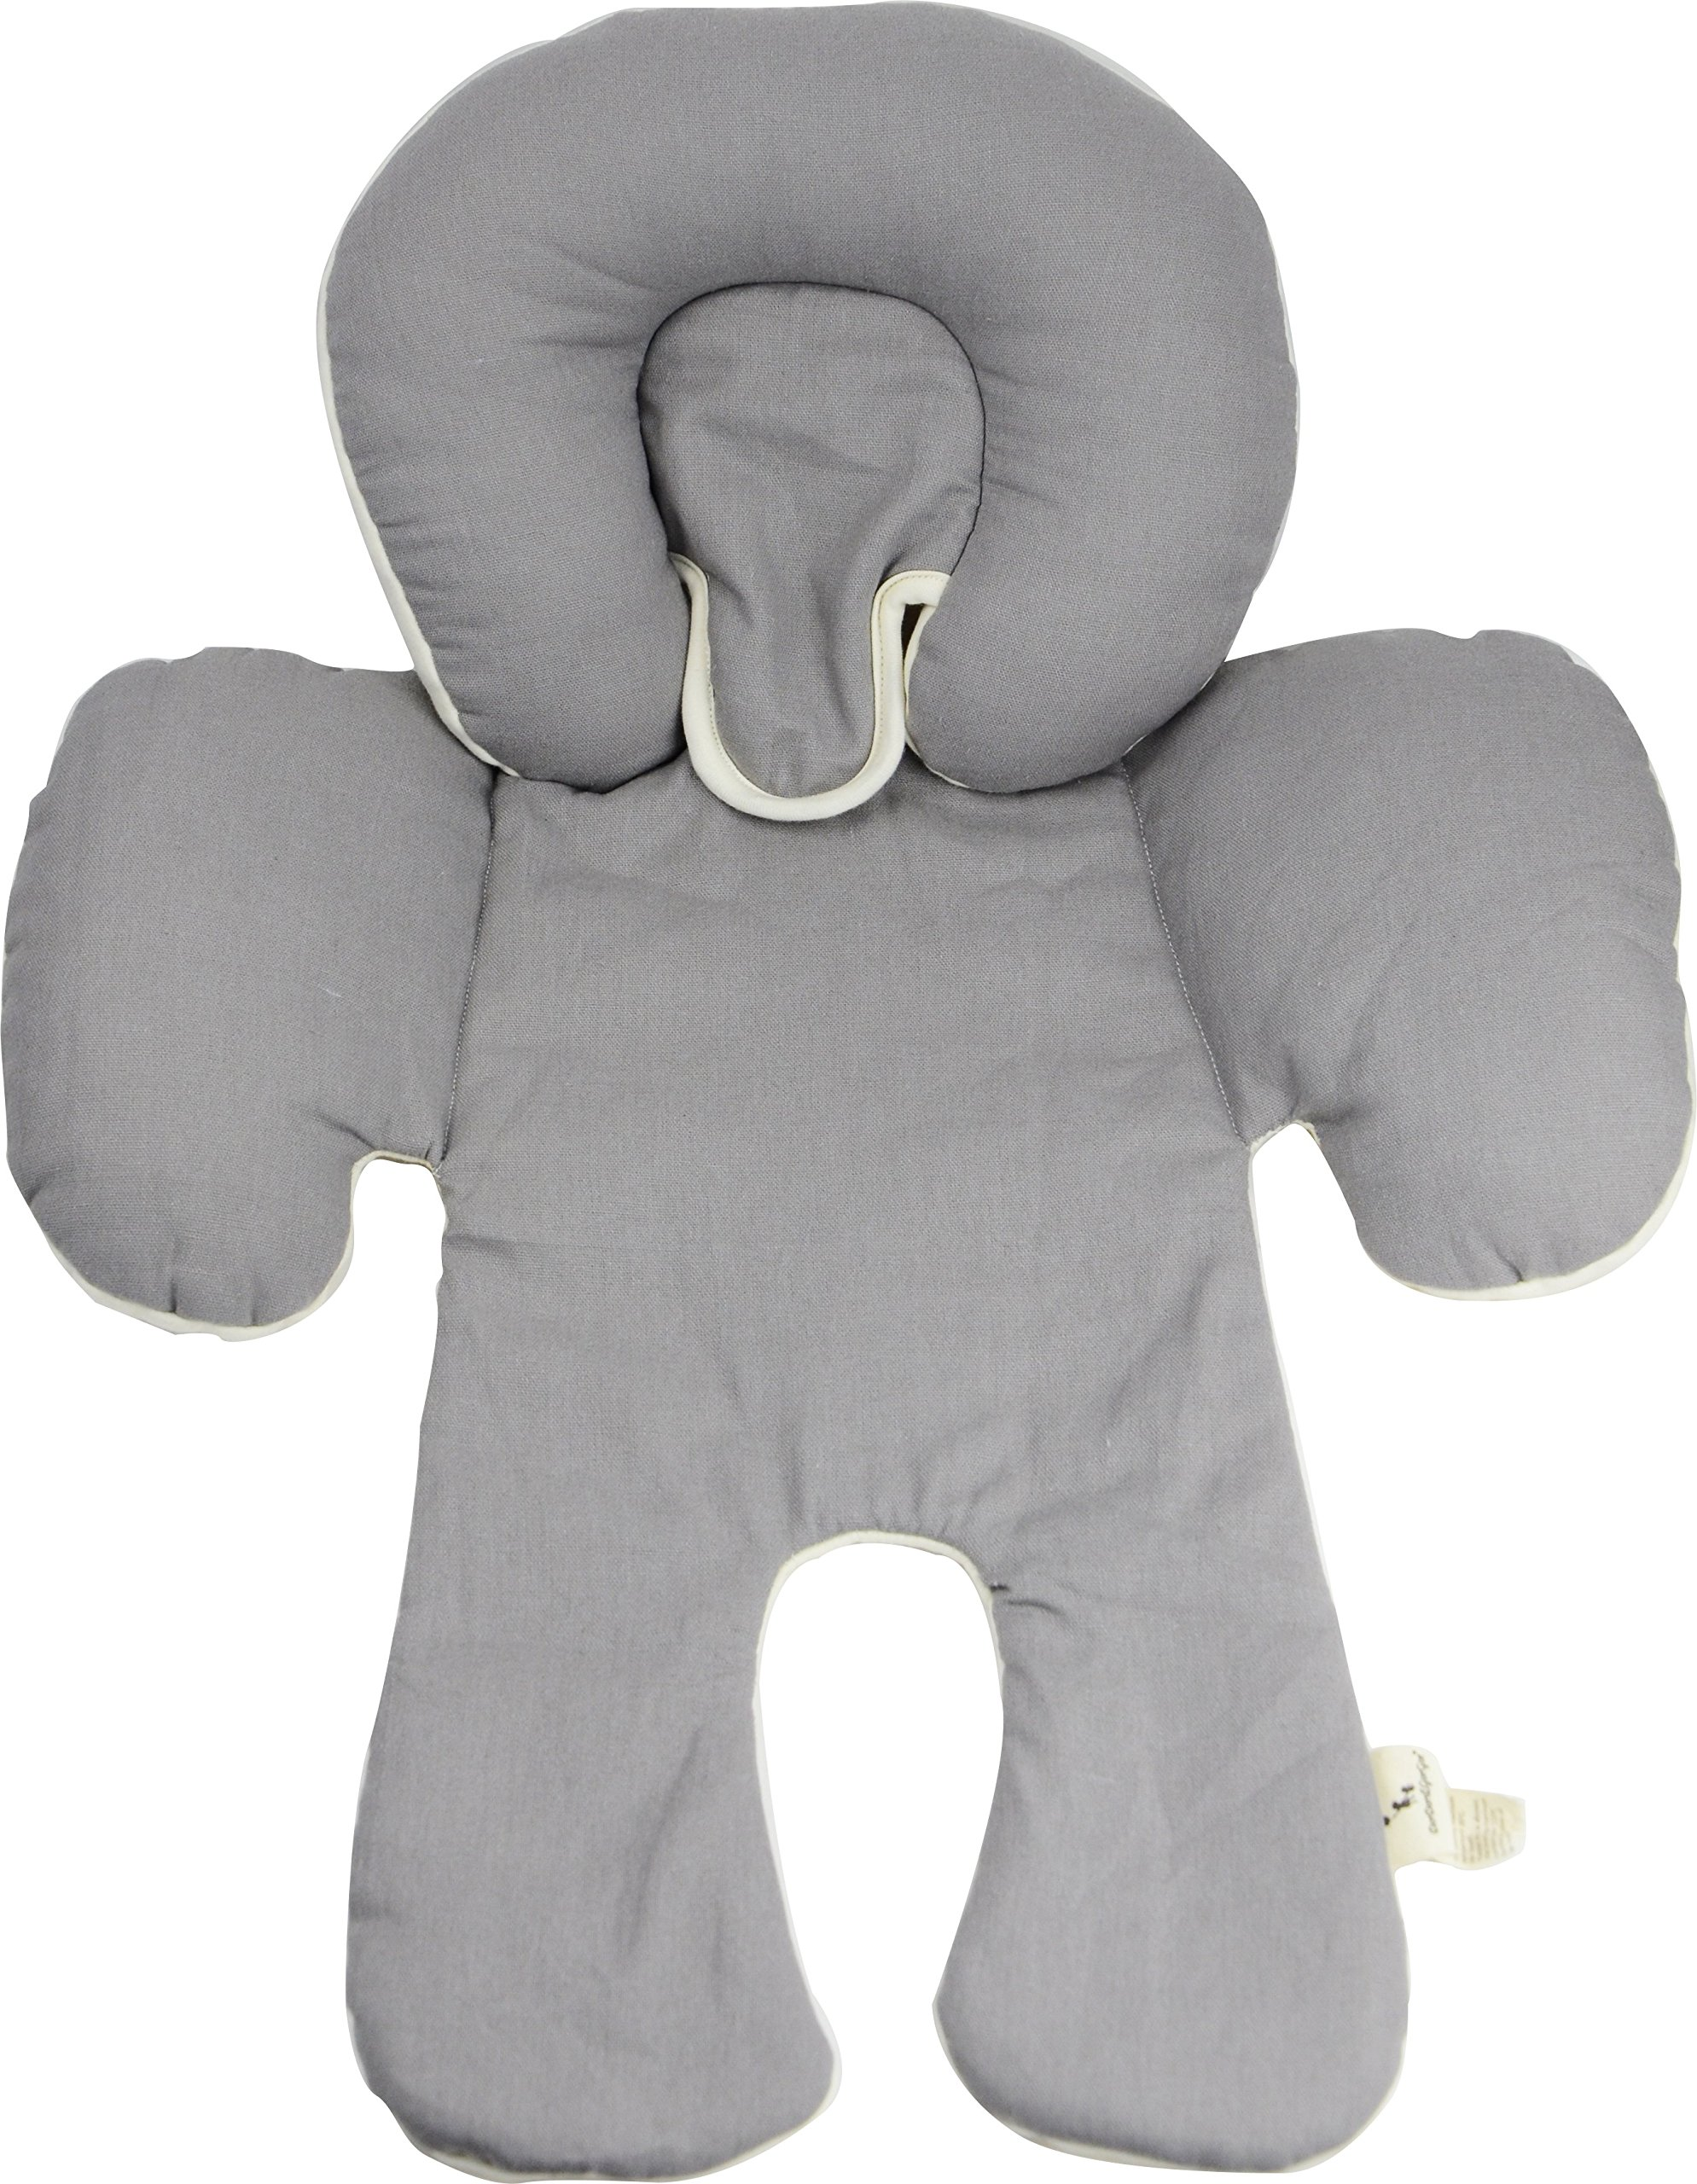 DorDor & GorGor Reversible Infant Head Support, Organic Cotton (Gray)